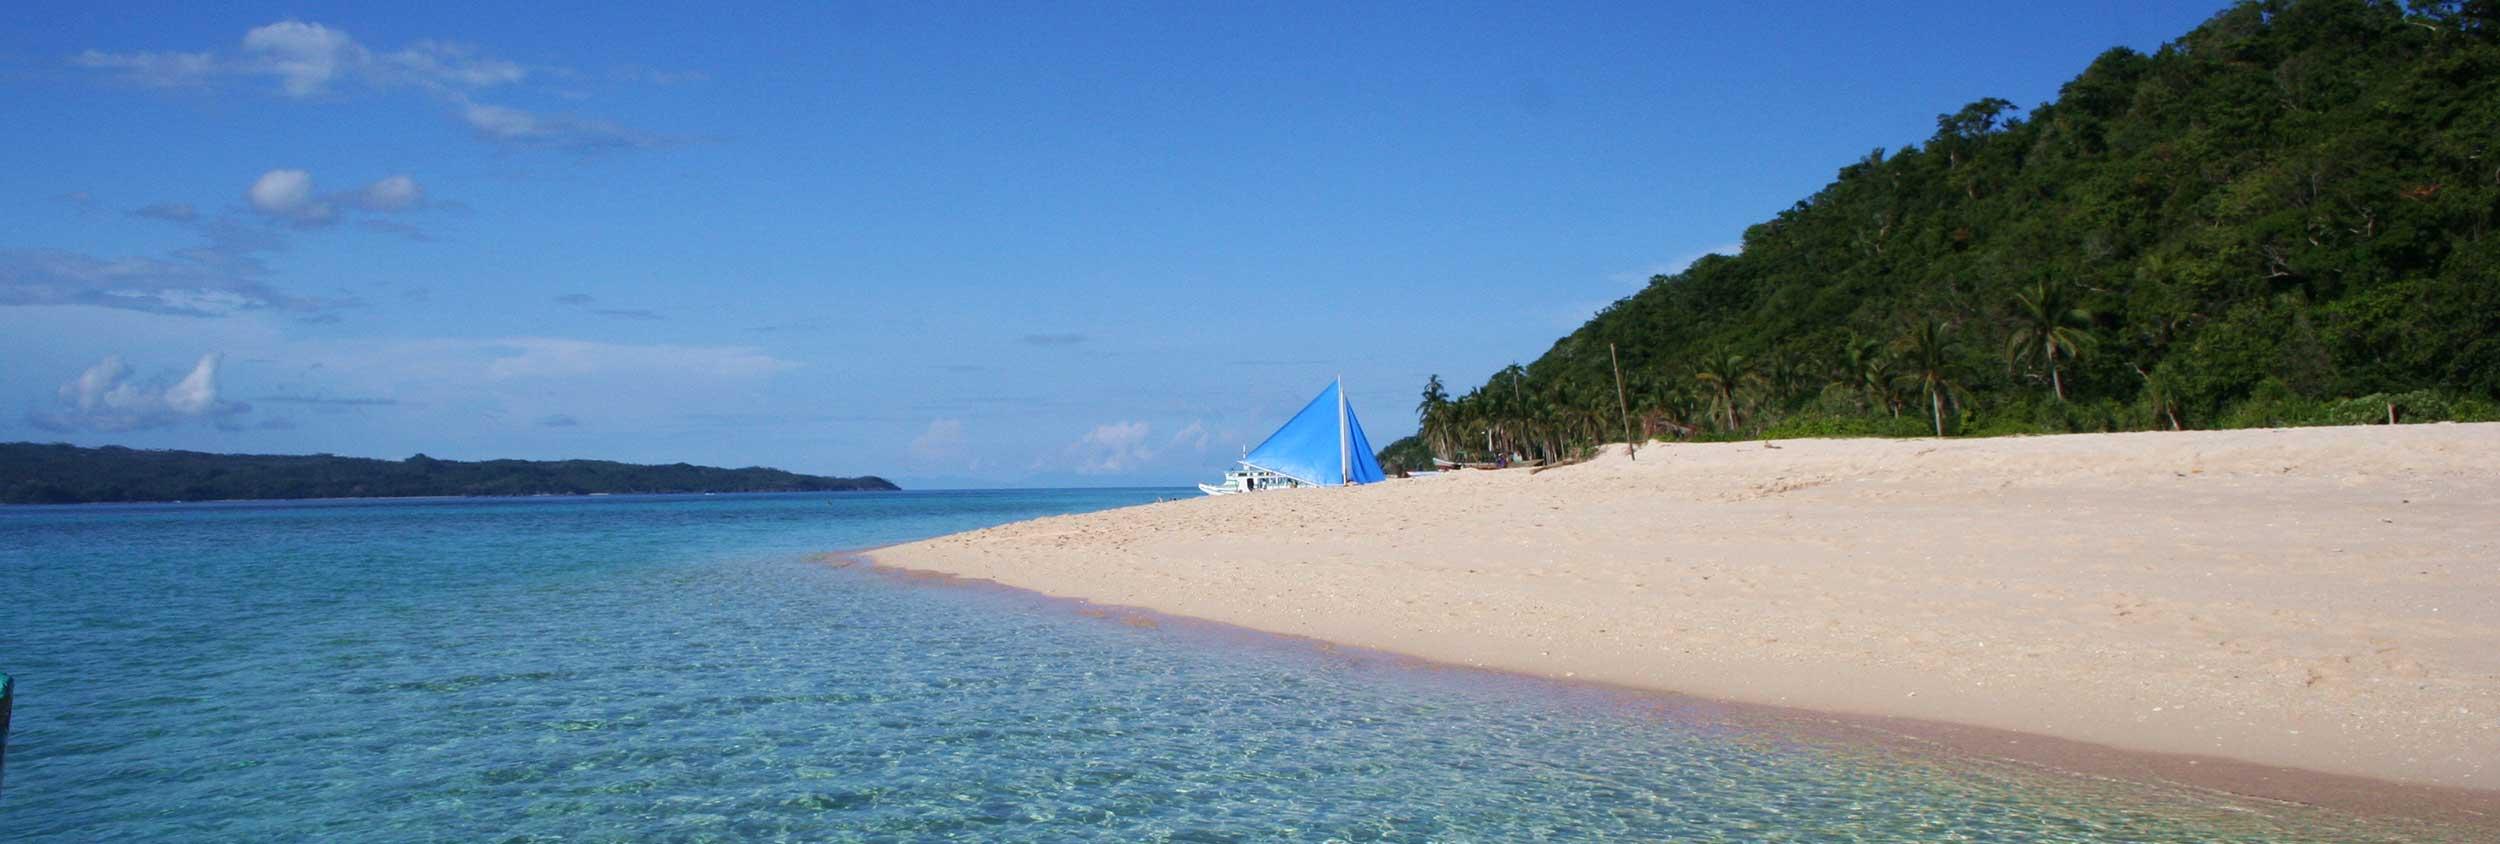 Reef Retreat Boracay Kiteworld travel